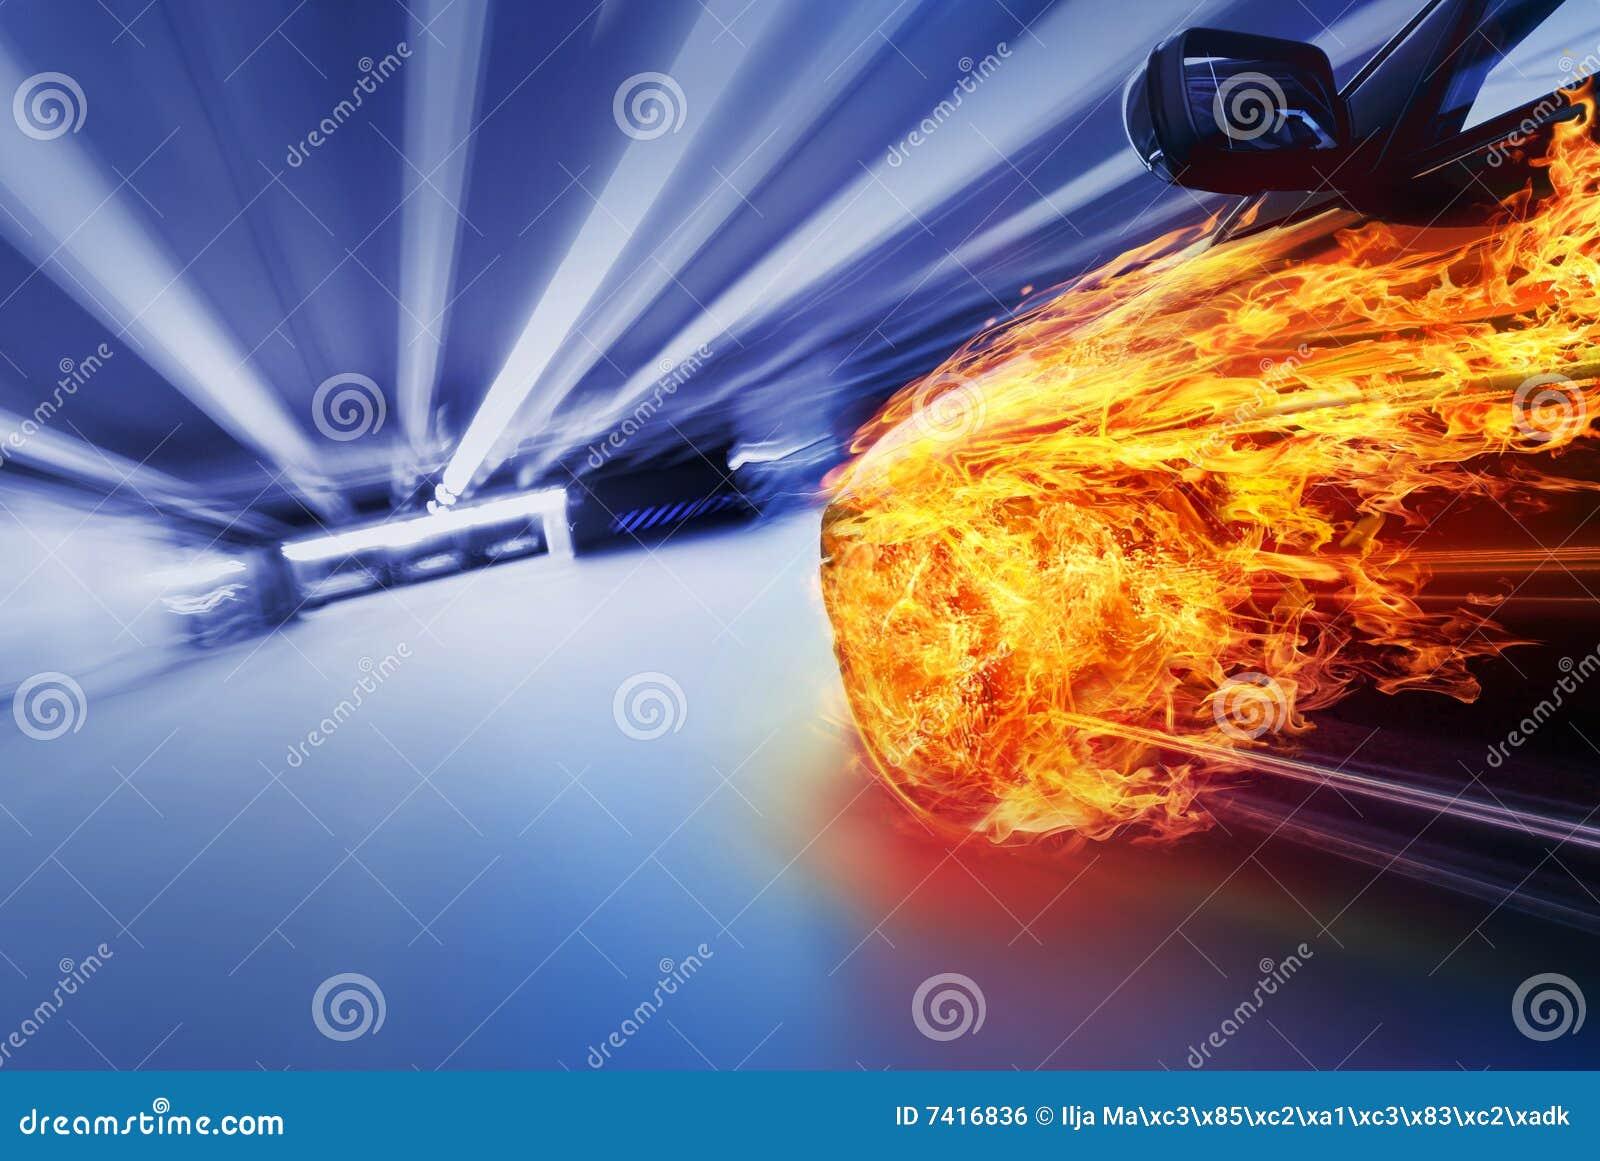 Burning car in tunnel